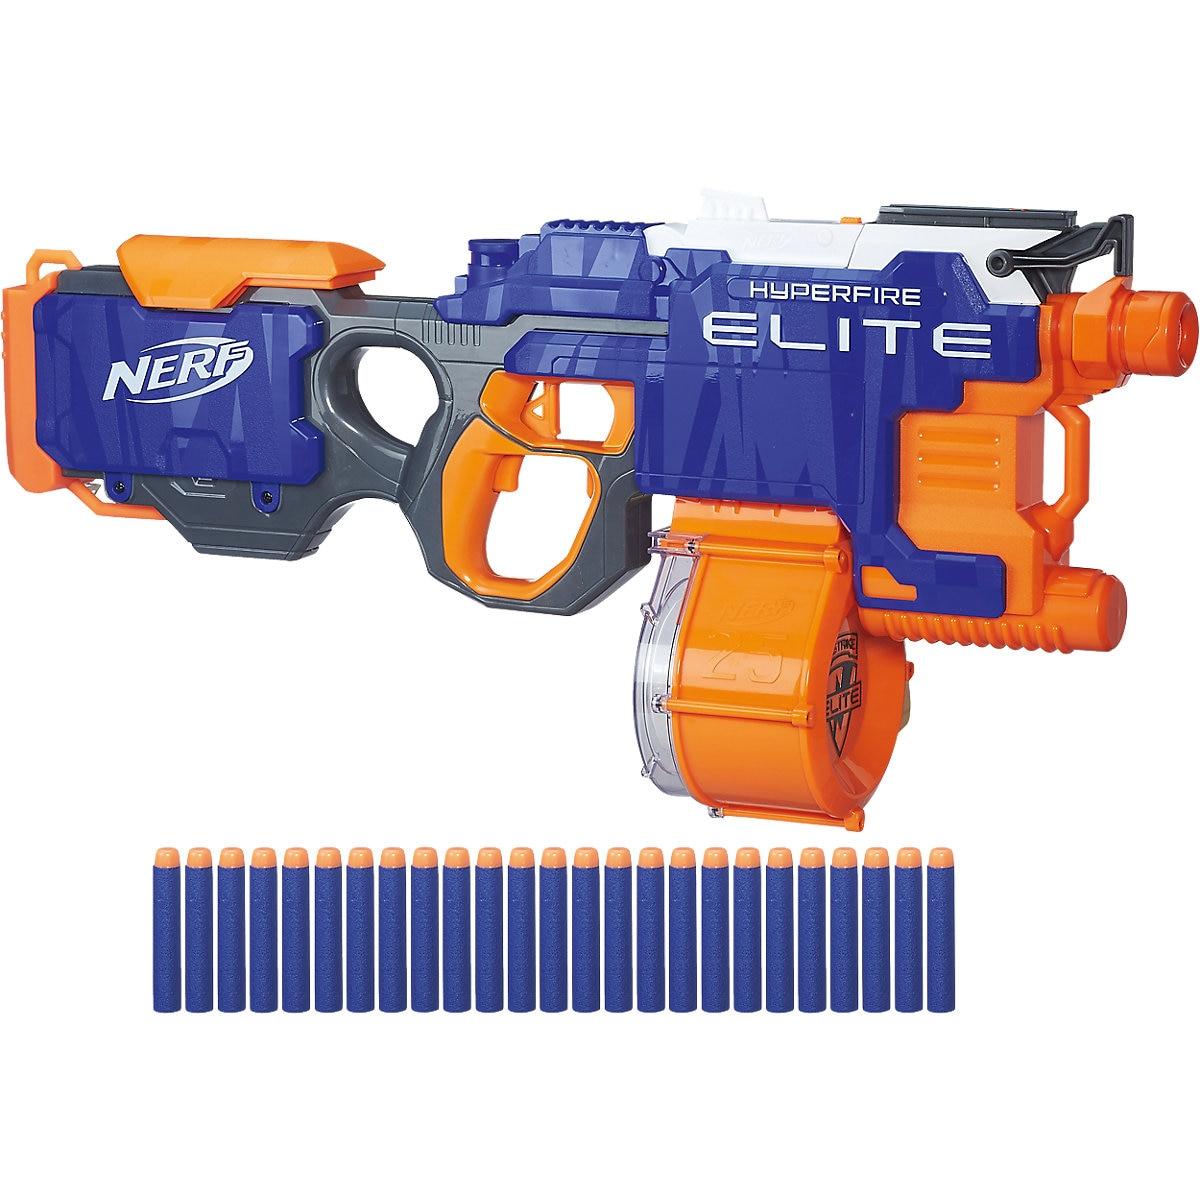 NERF jouet pistolets 4651997 pistolet arme jouets jeux pneumatique blaster garçon orbiz revolver plein air plaisir sport MTpromo